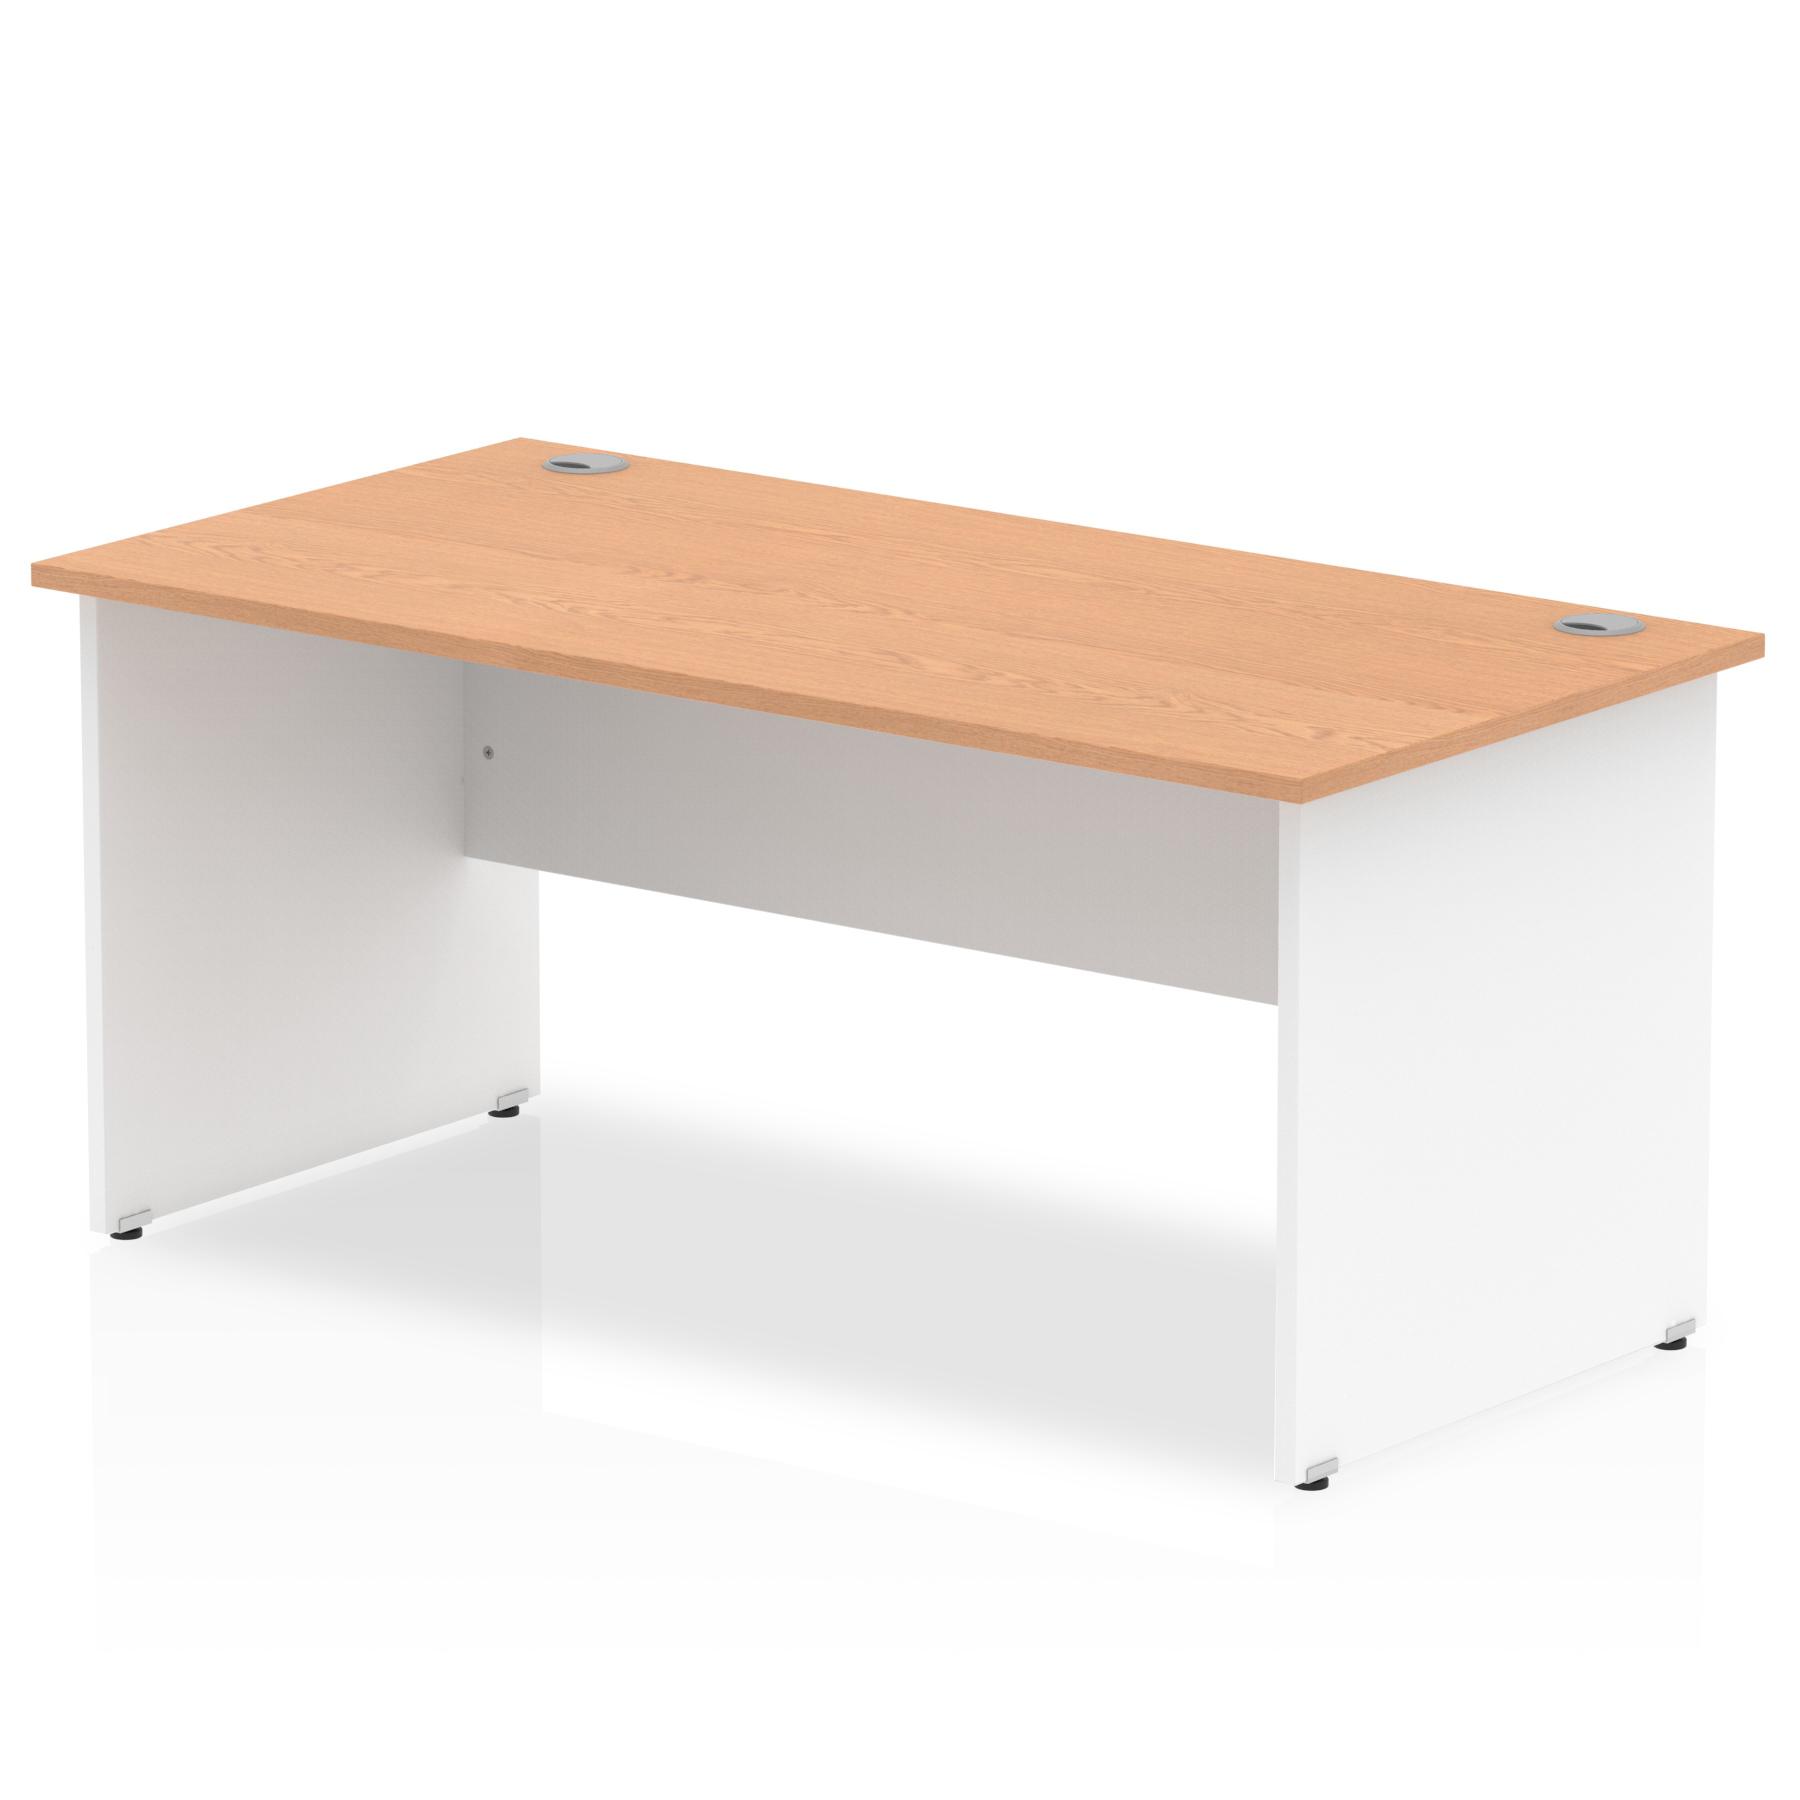 Trexus Desk Rectangle Panel End 1600x800mm Oak Top White Panels Ref TT000017